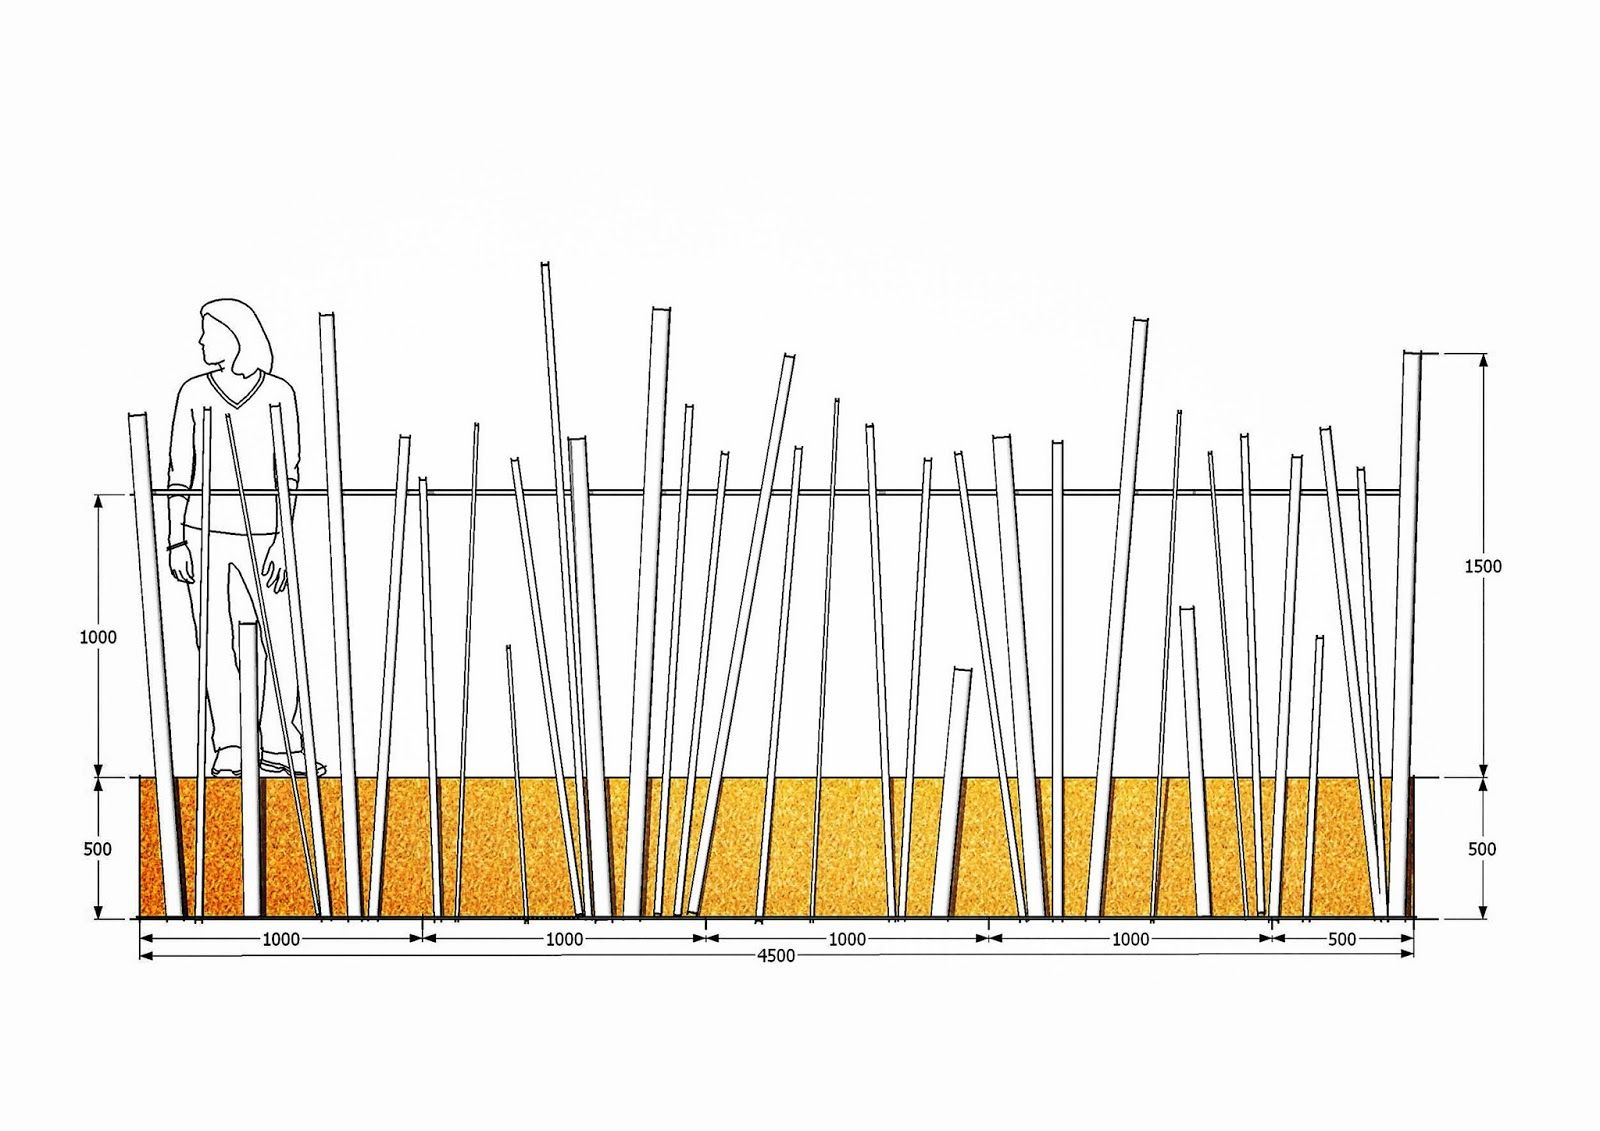 ferronnerie m tallerie serrurerie 79 deux s vres l 39 art du fer play garde corps bambou d 39 acier. Black Bedroom Furniture Sets. Home Design Ideas